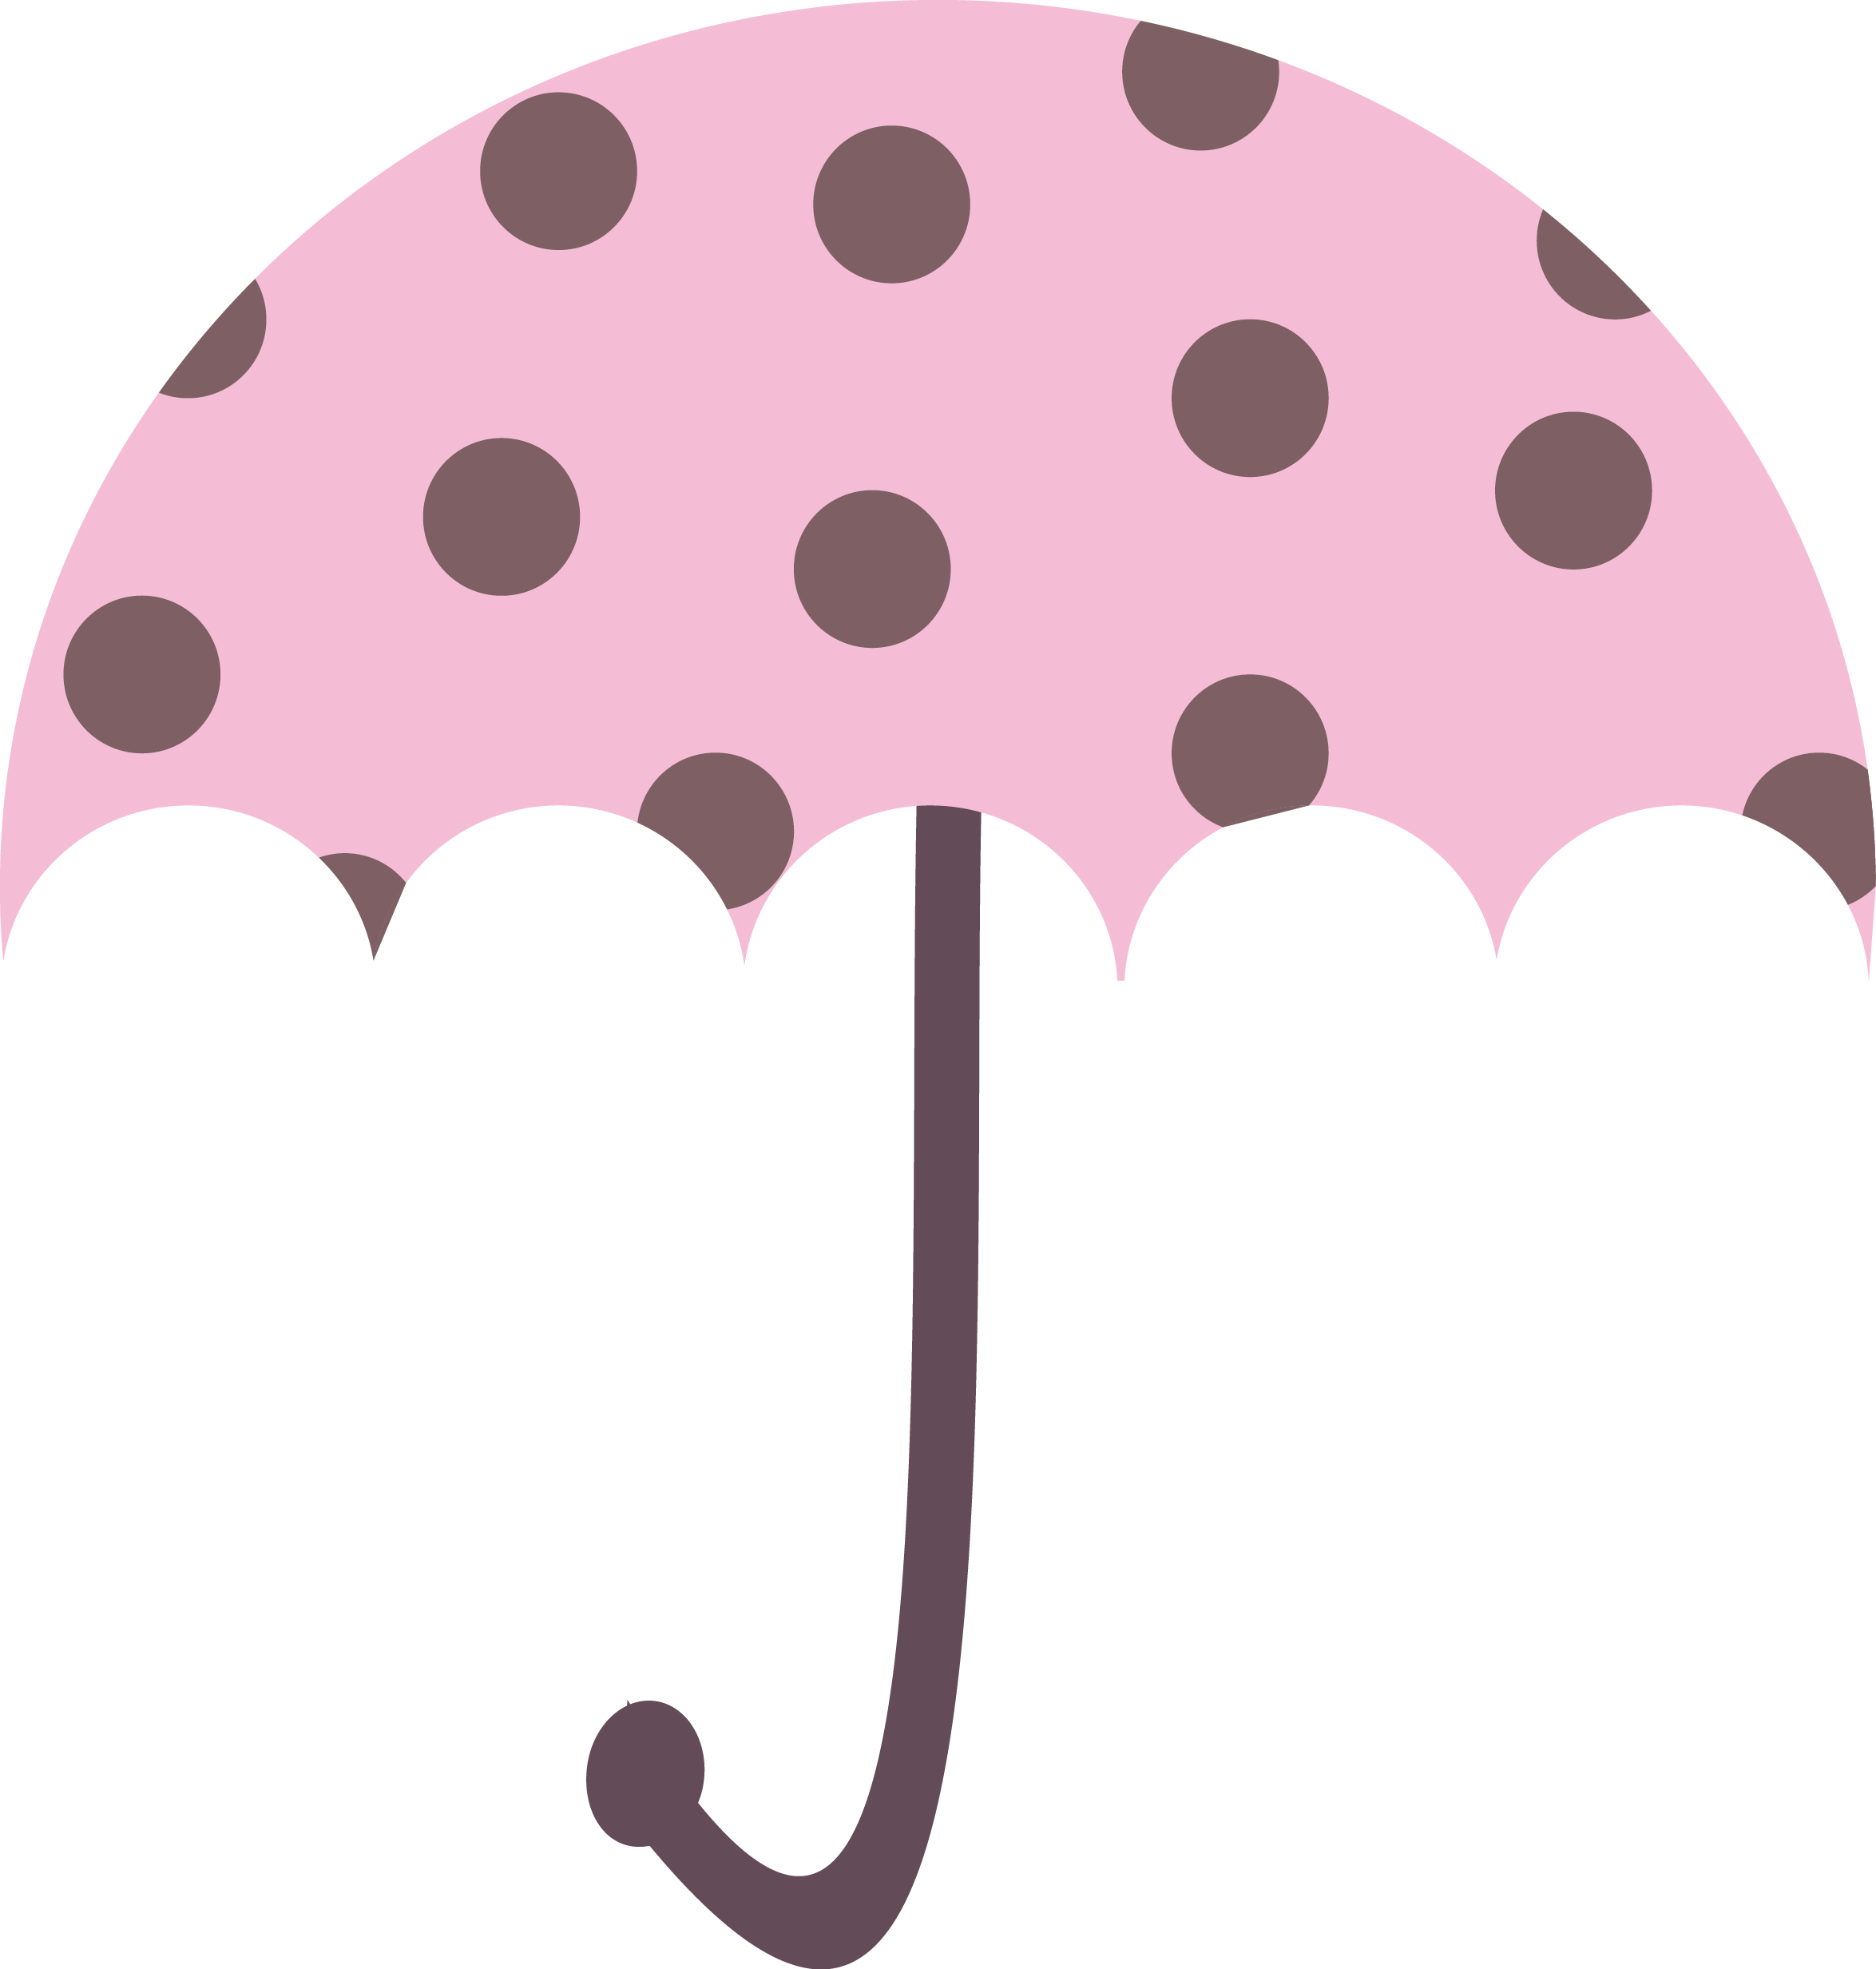 Umbrella image - vector clip art online, royalty free & public domain